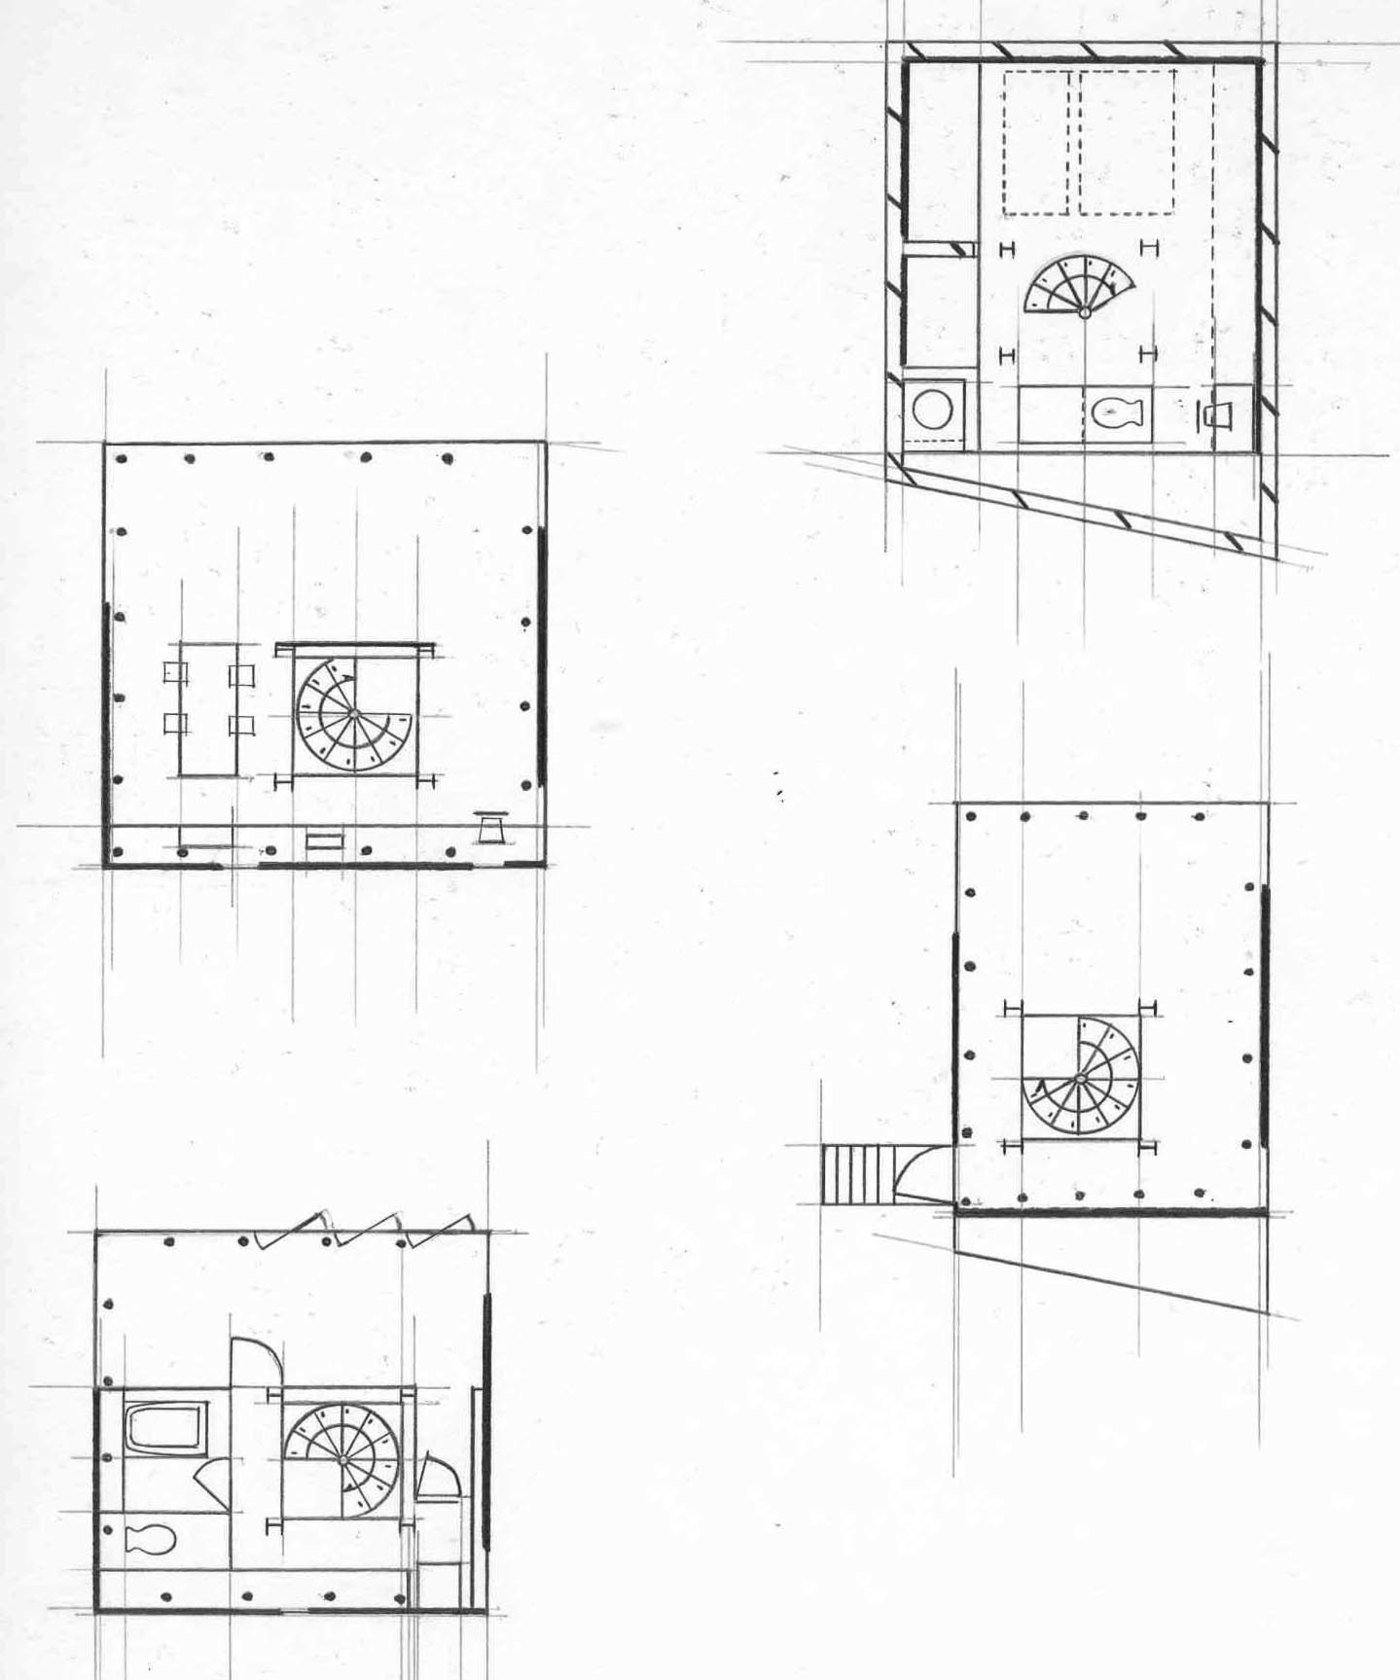 Year One Recreating Villa Savoye Small House By Andre Kumar Alexander At Coroflot Com